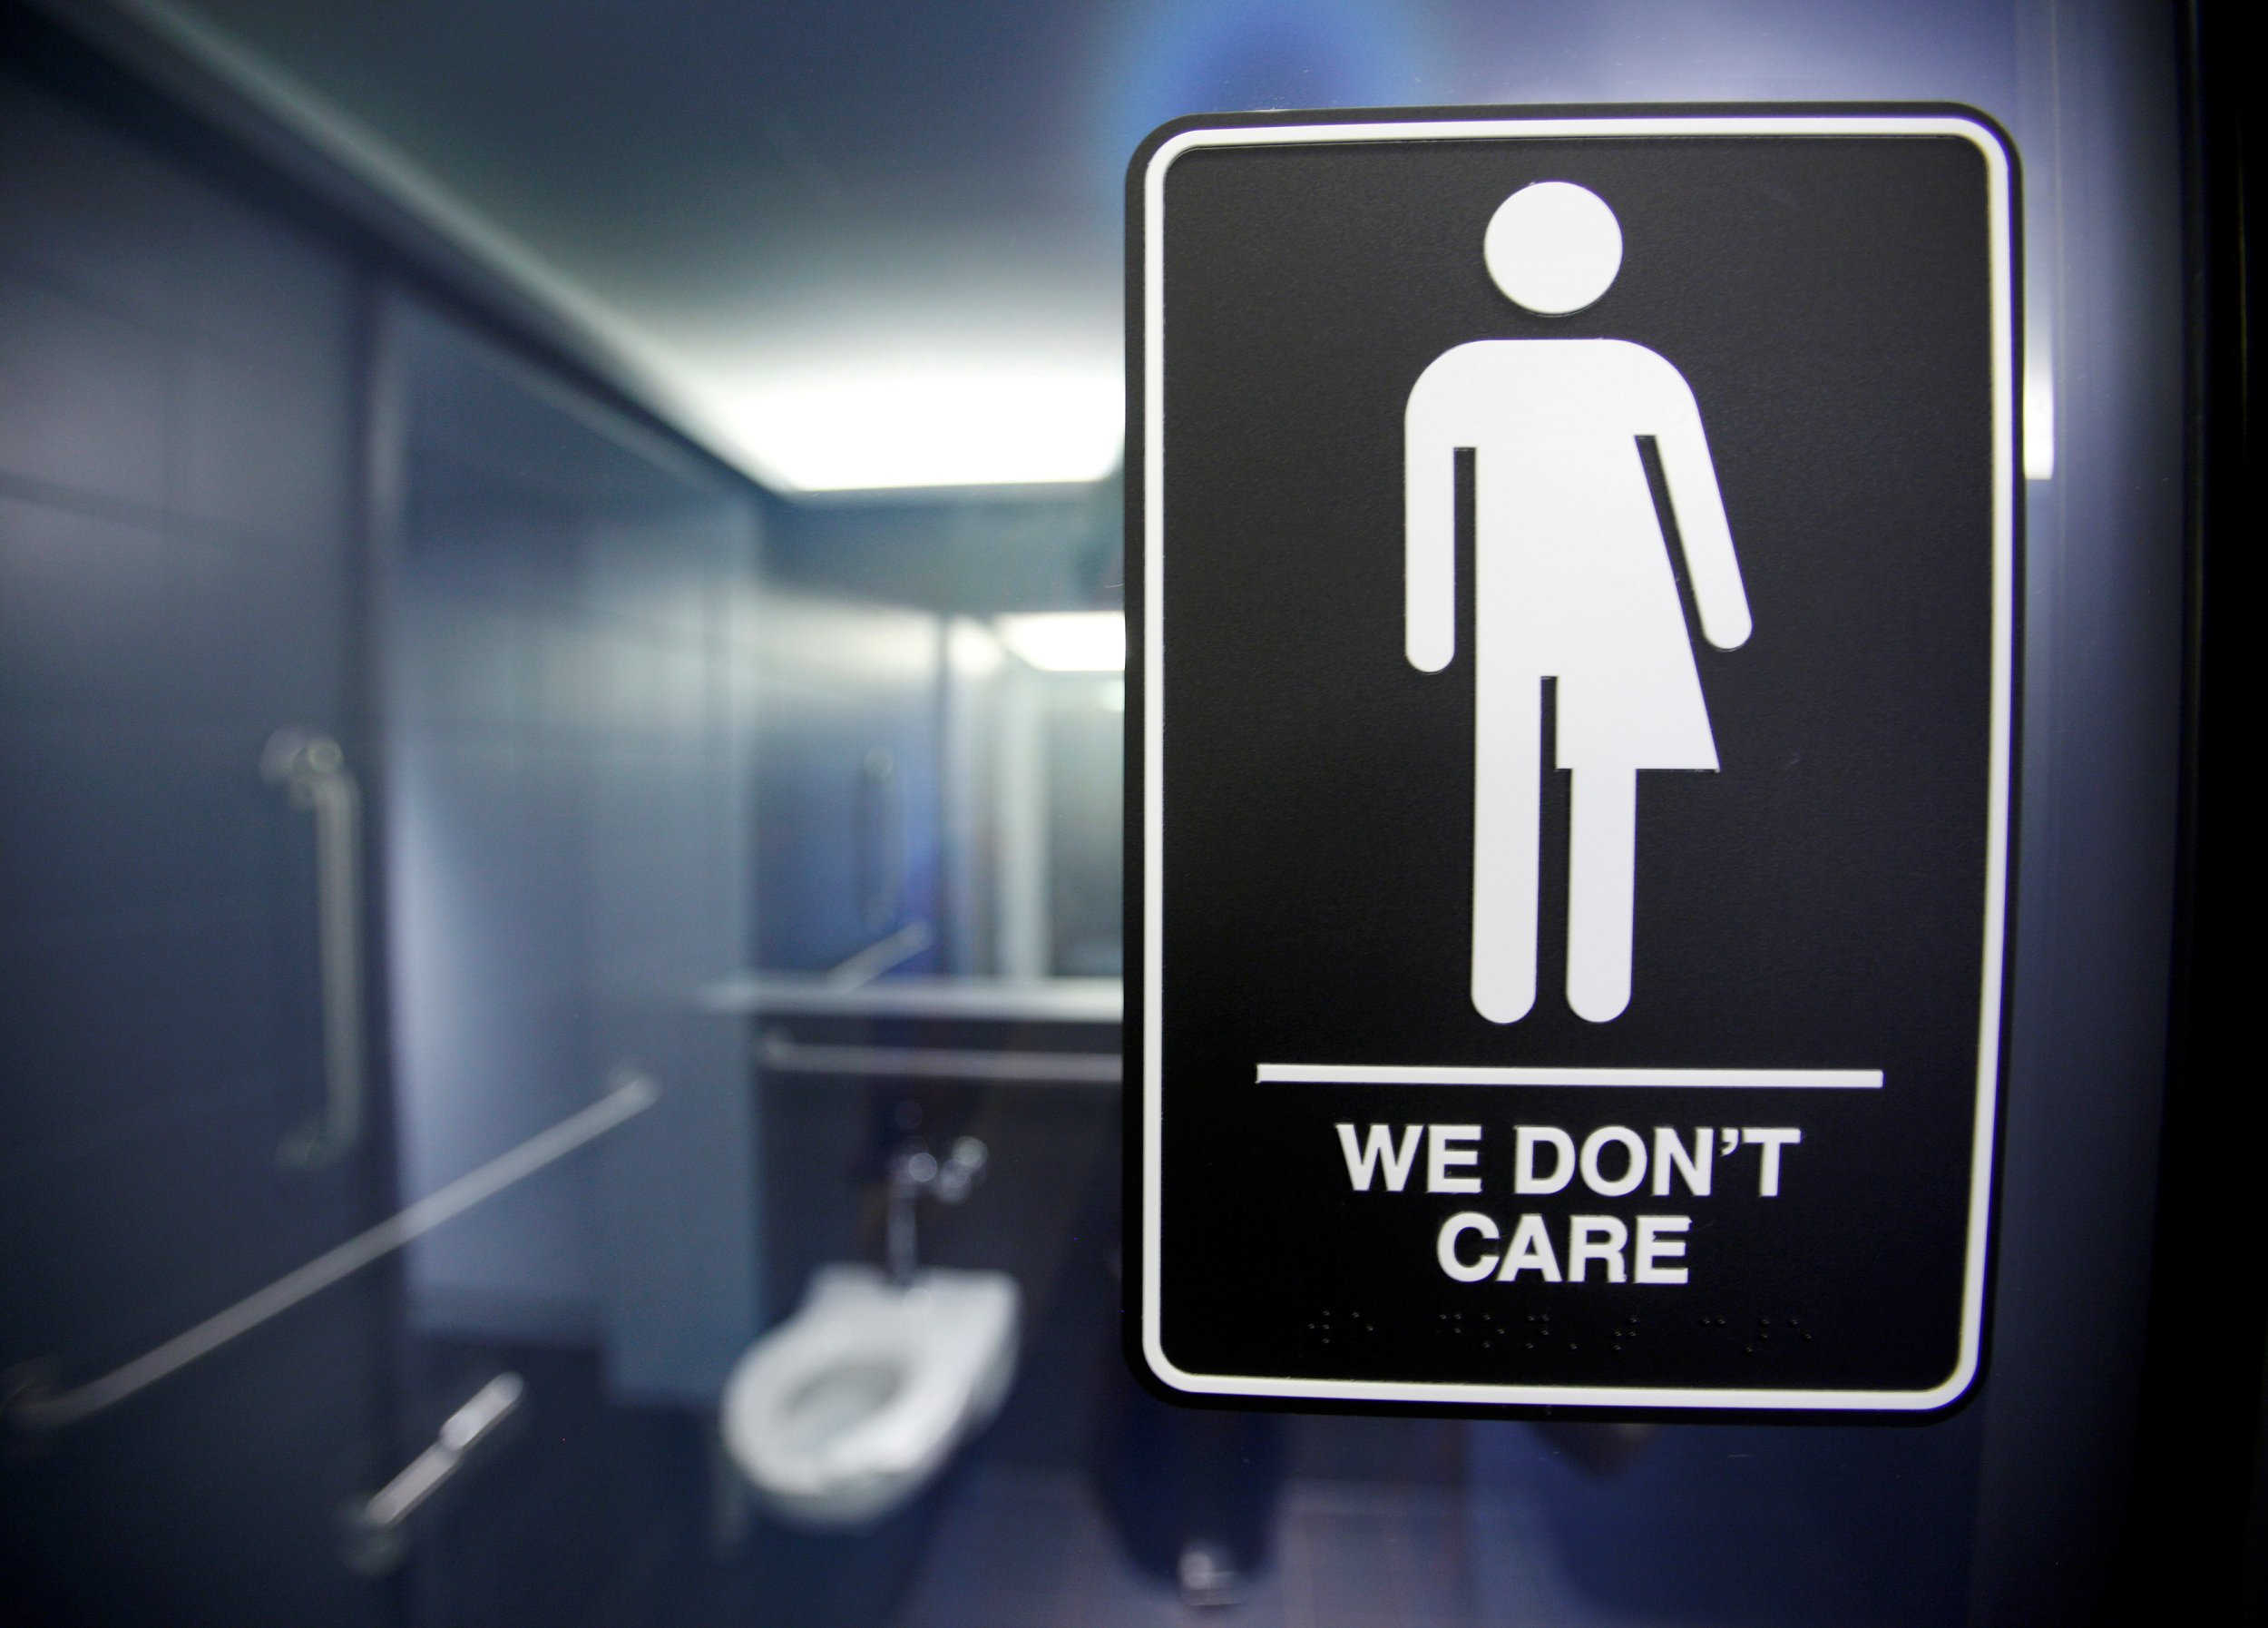 School Bathrooms transgender students avoid school bathrooms despite health